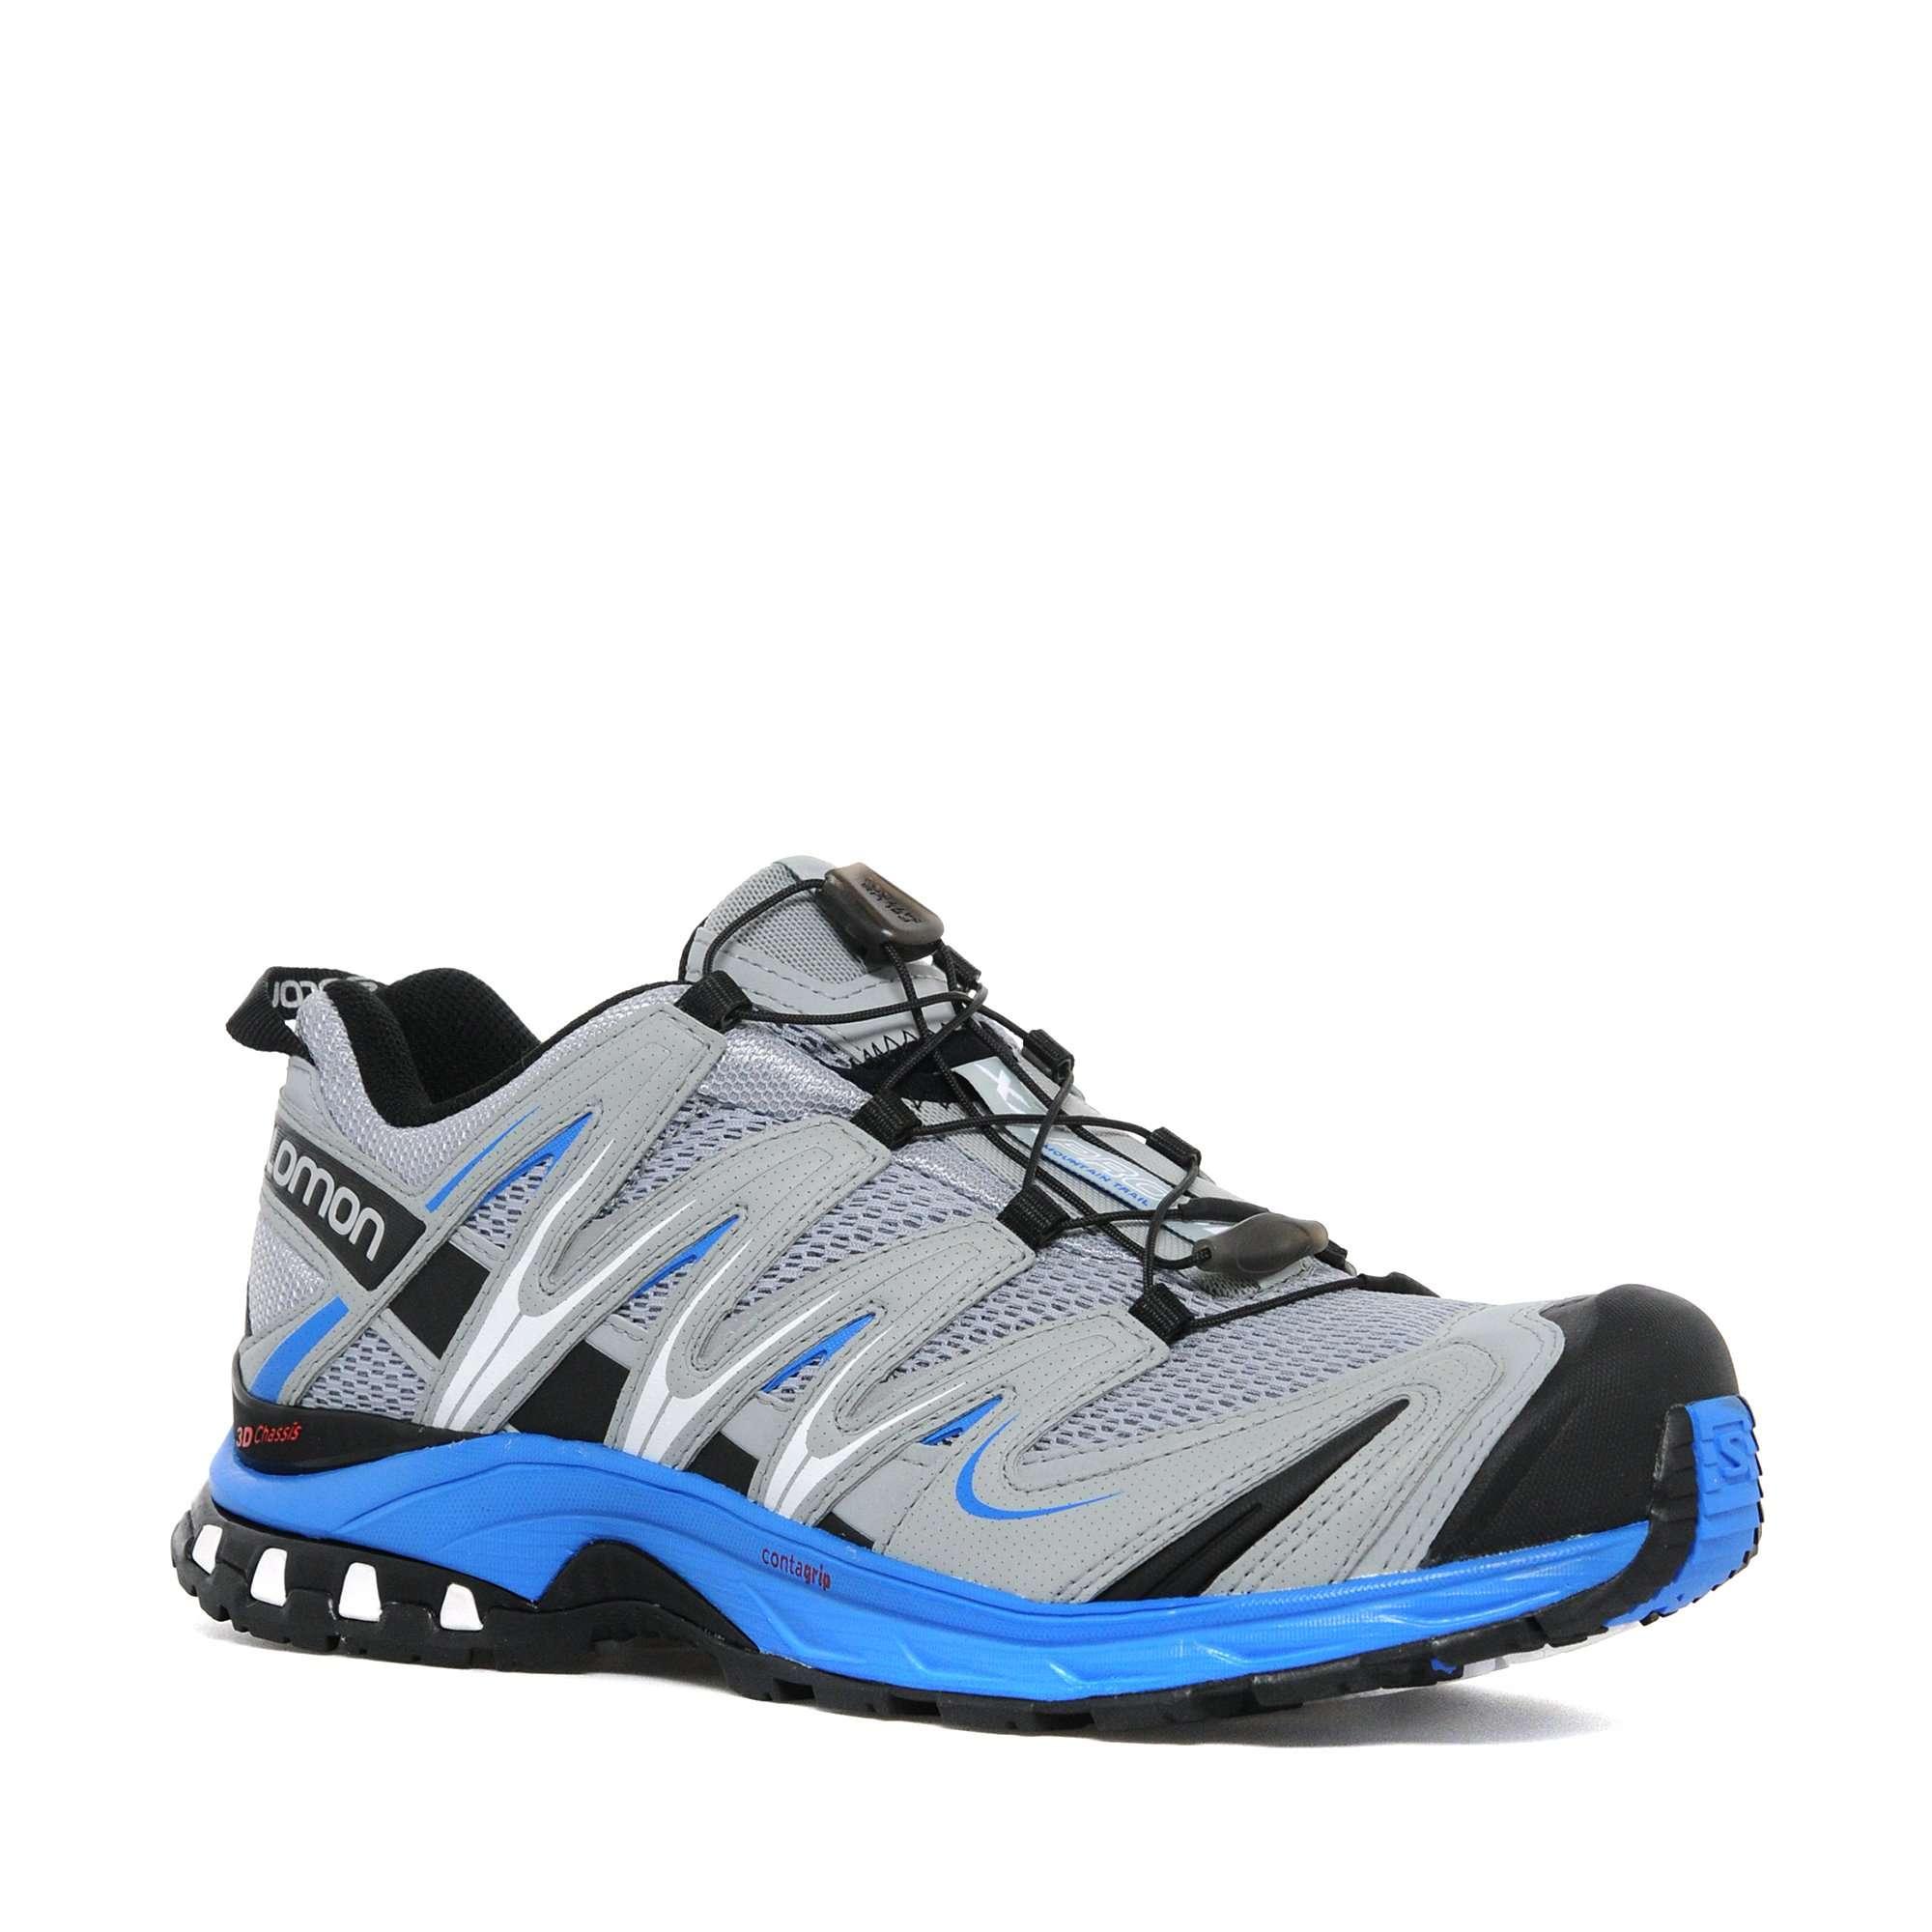 SALOMON Men's XA Pro 3D GORE-TEX® Trail Running Shoes